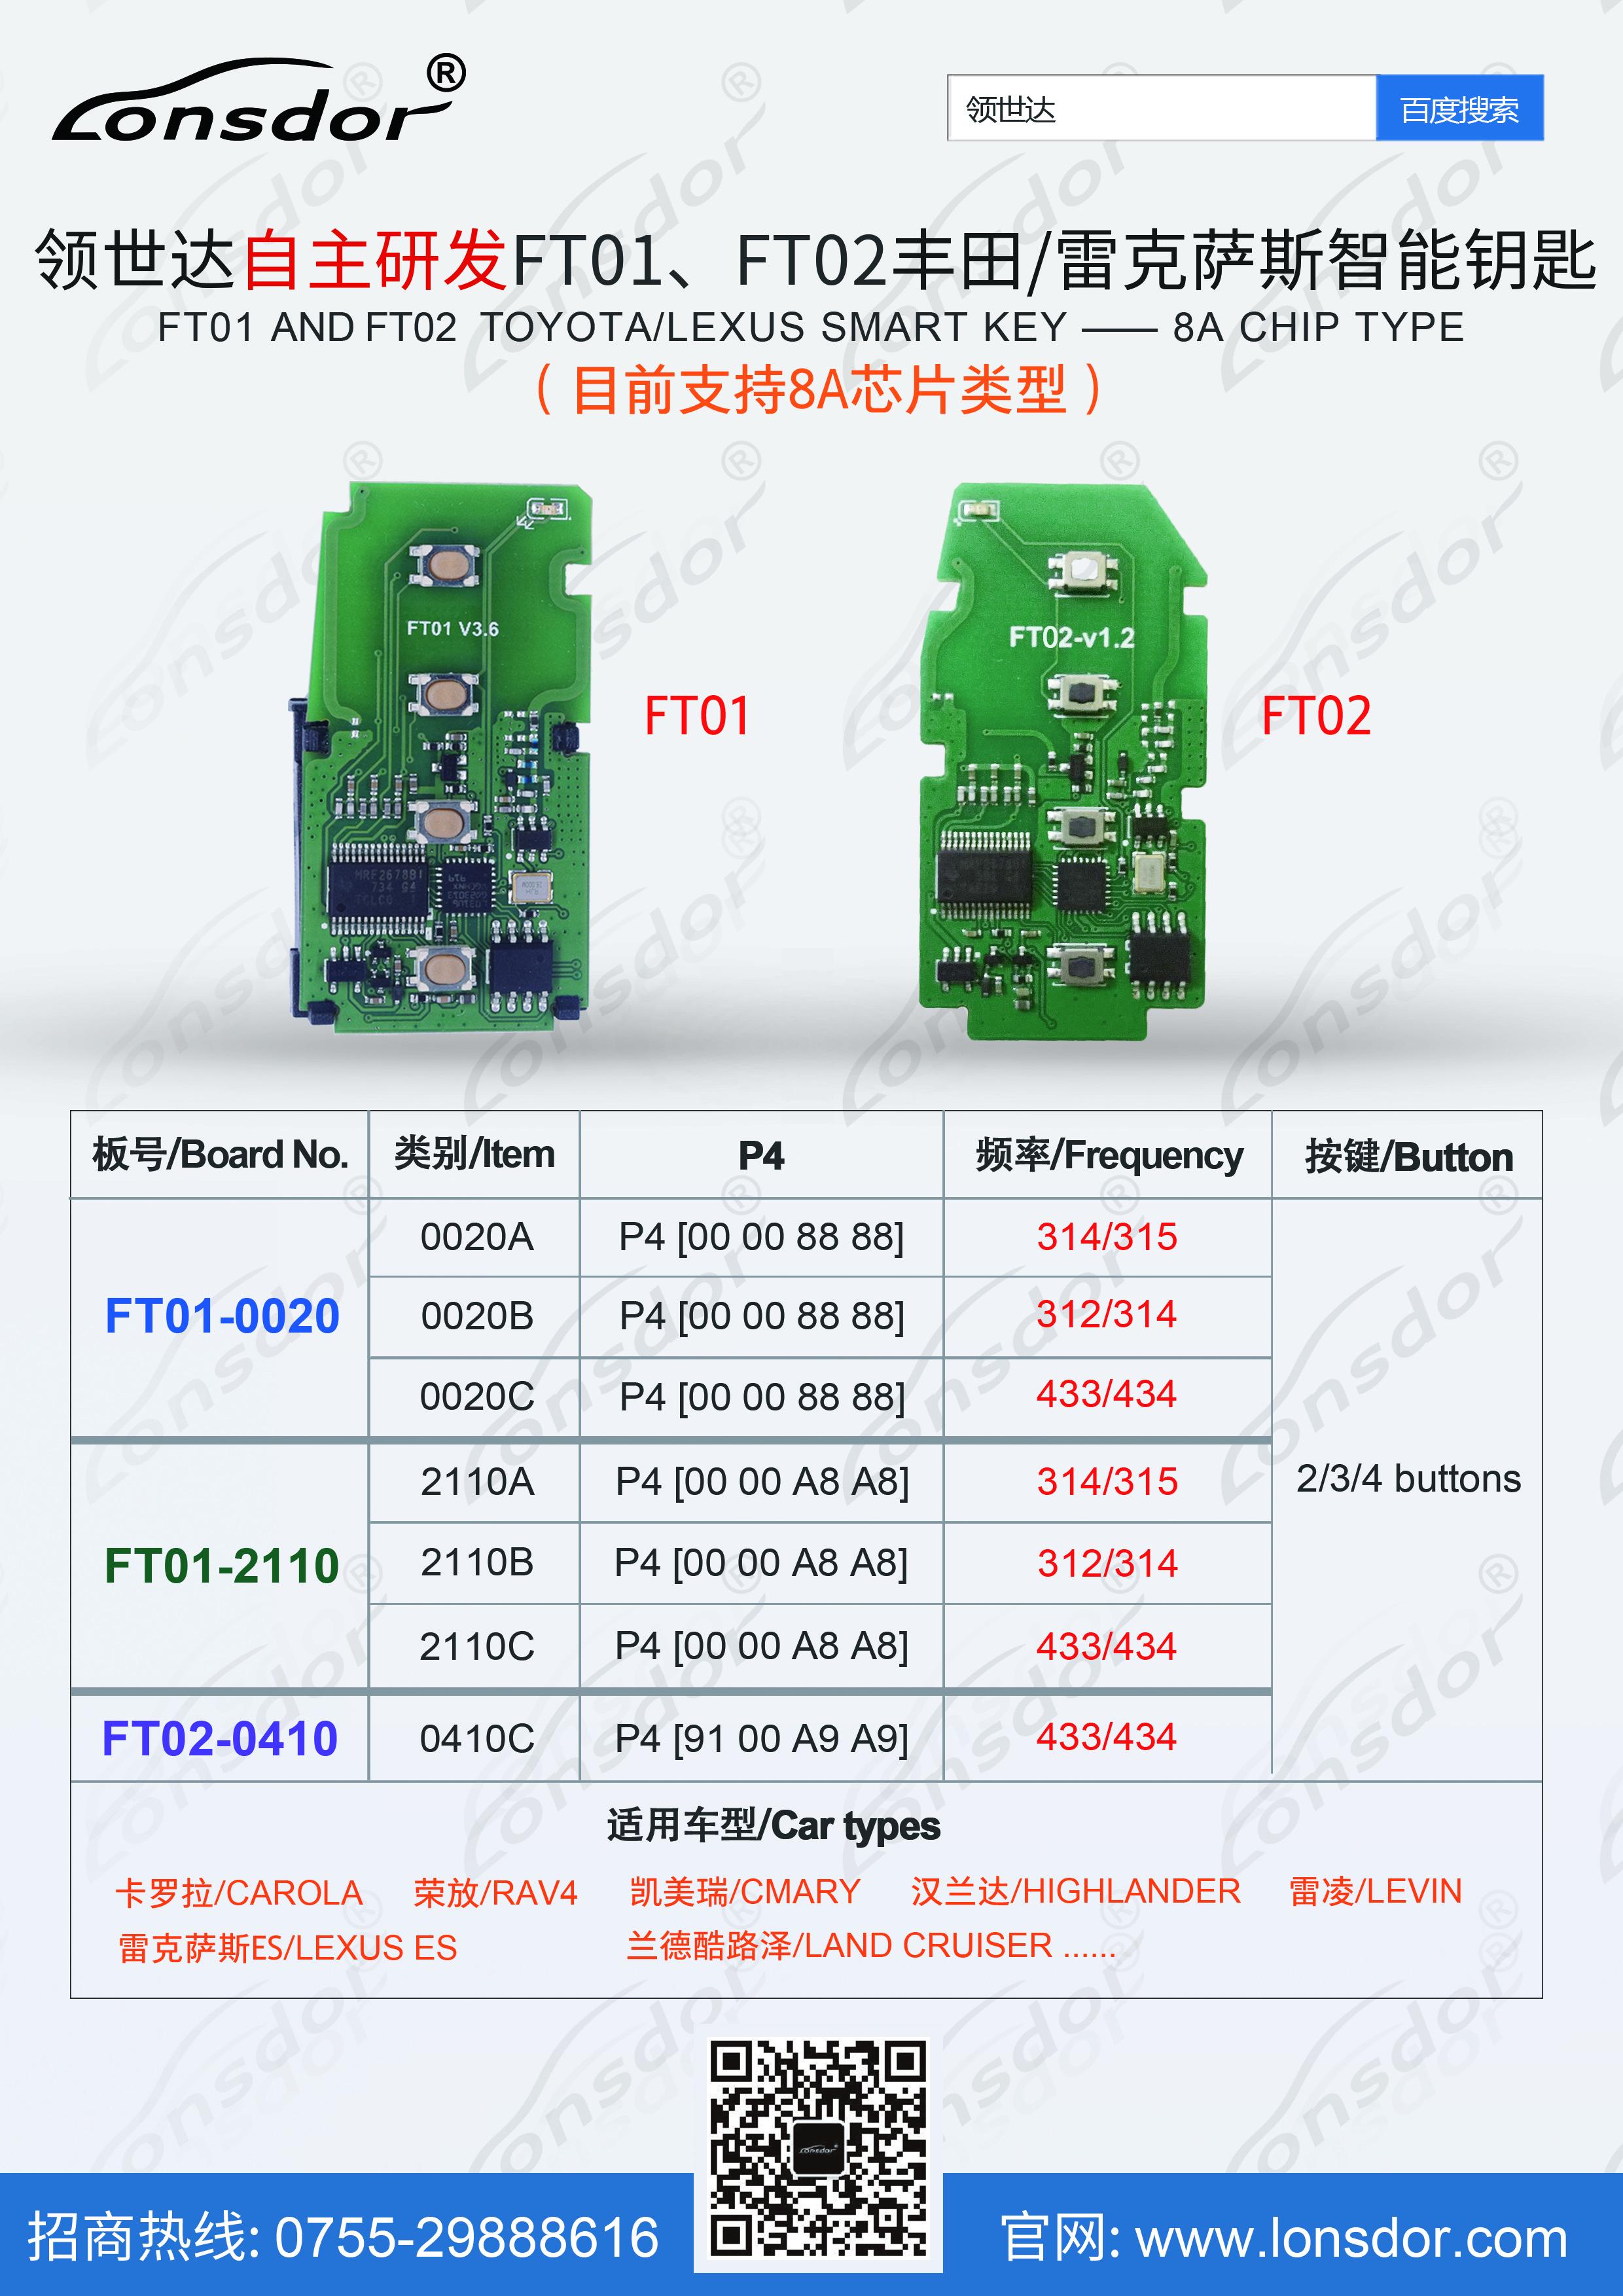 FT01宣传单(正面)尺寸:A4